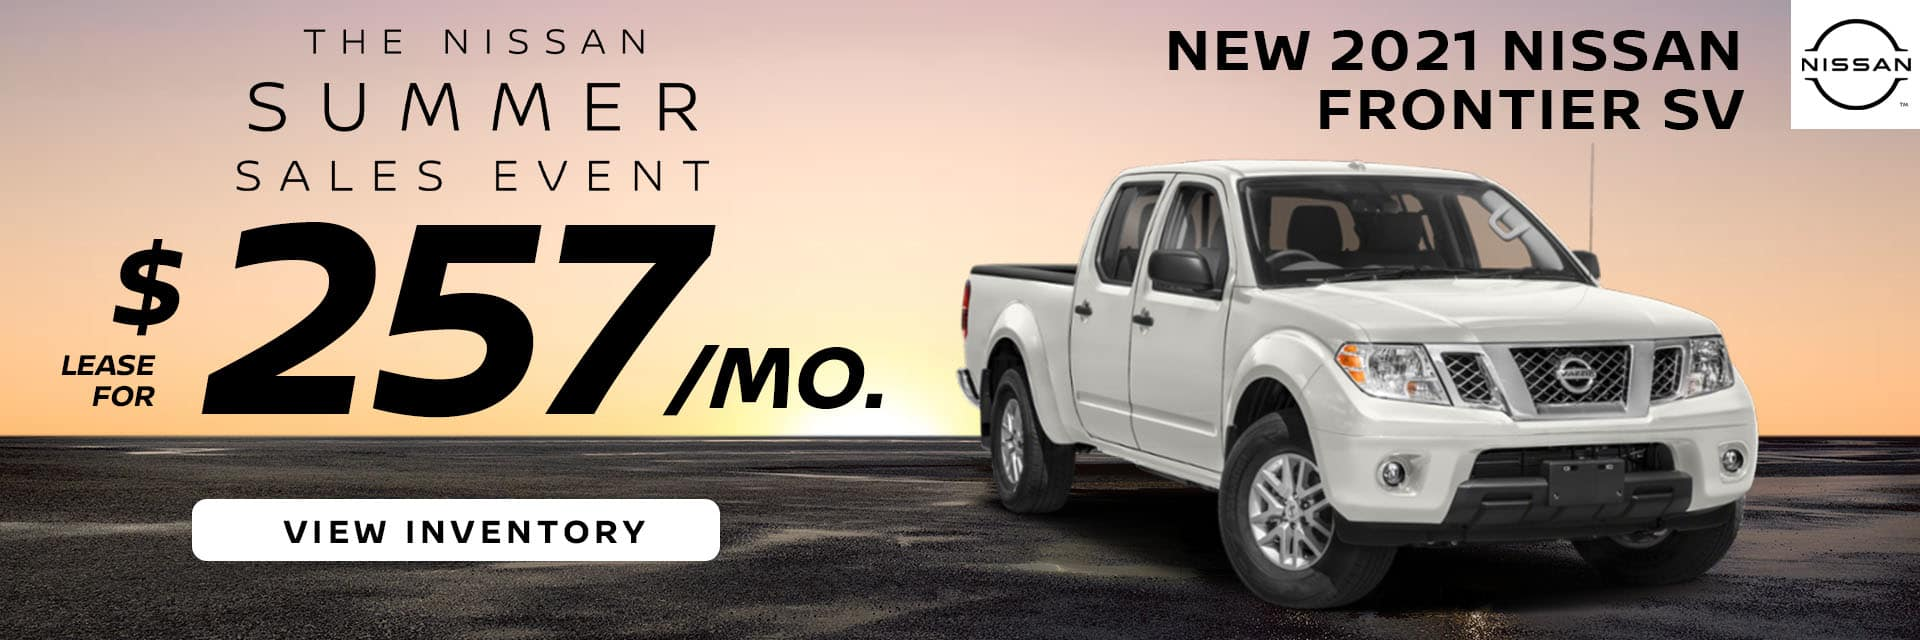 CNSN-June 2021-2021 Nissan Frontier copy